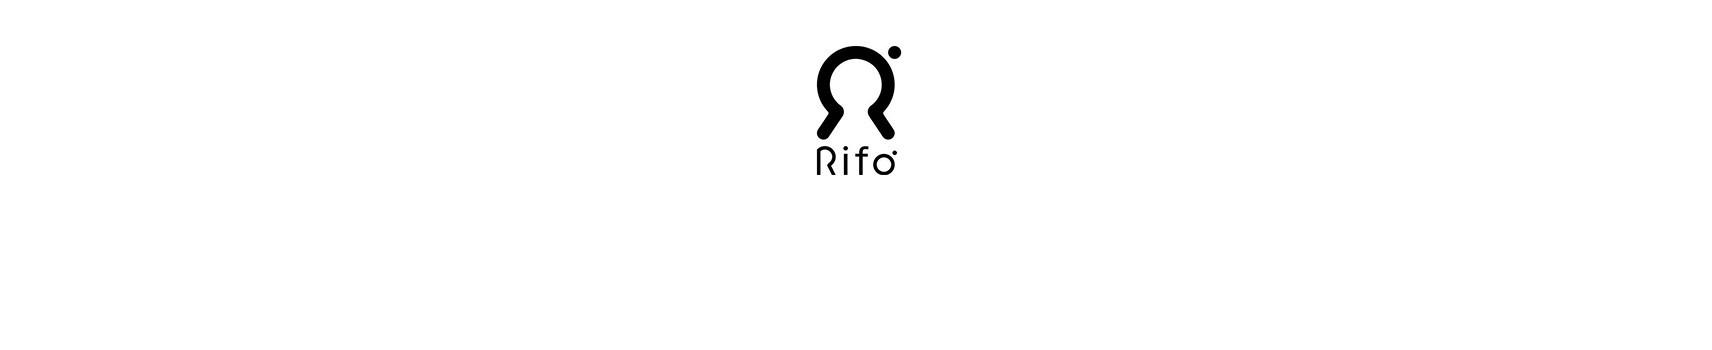 Rifò - Moda Uomo circolare Made in Italy | Agemina Boutique